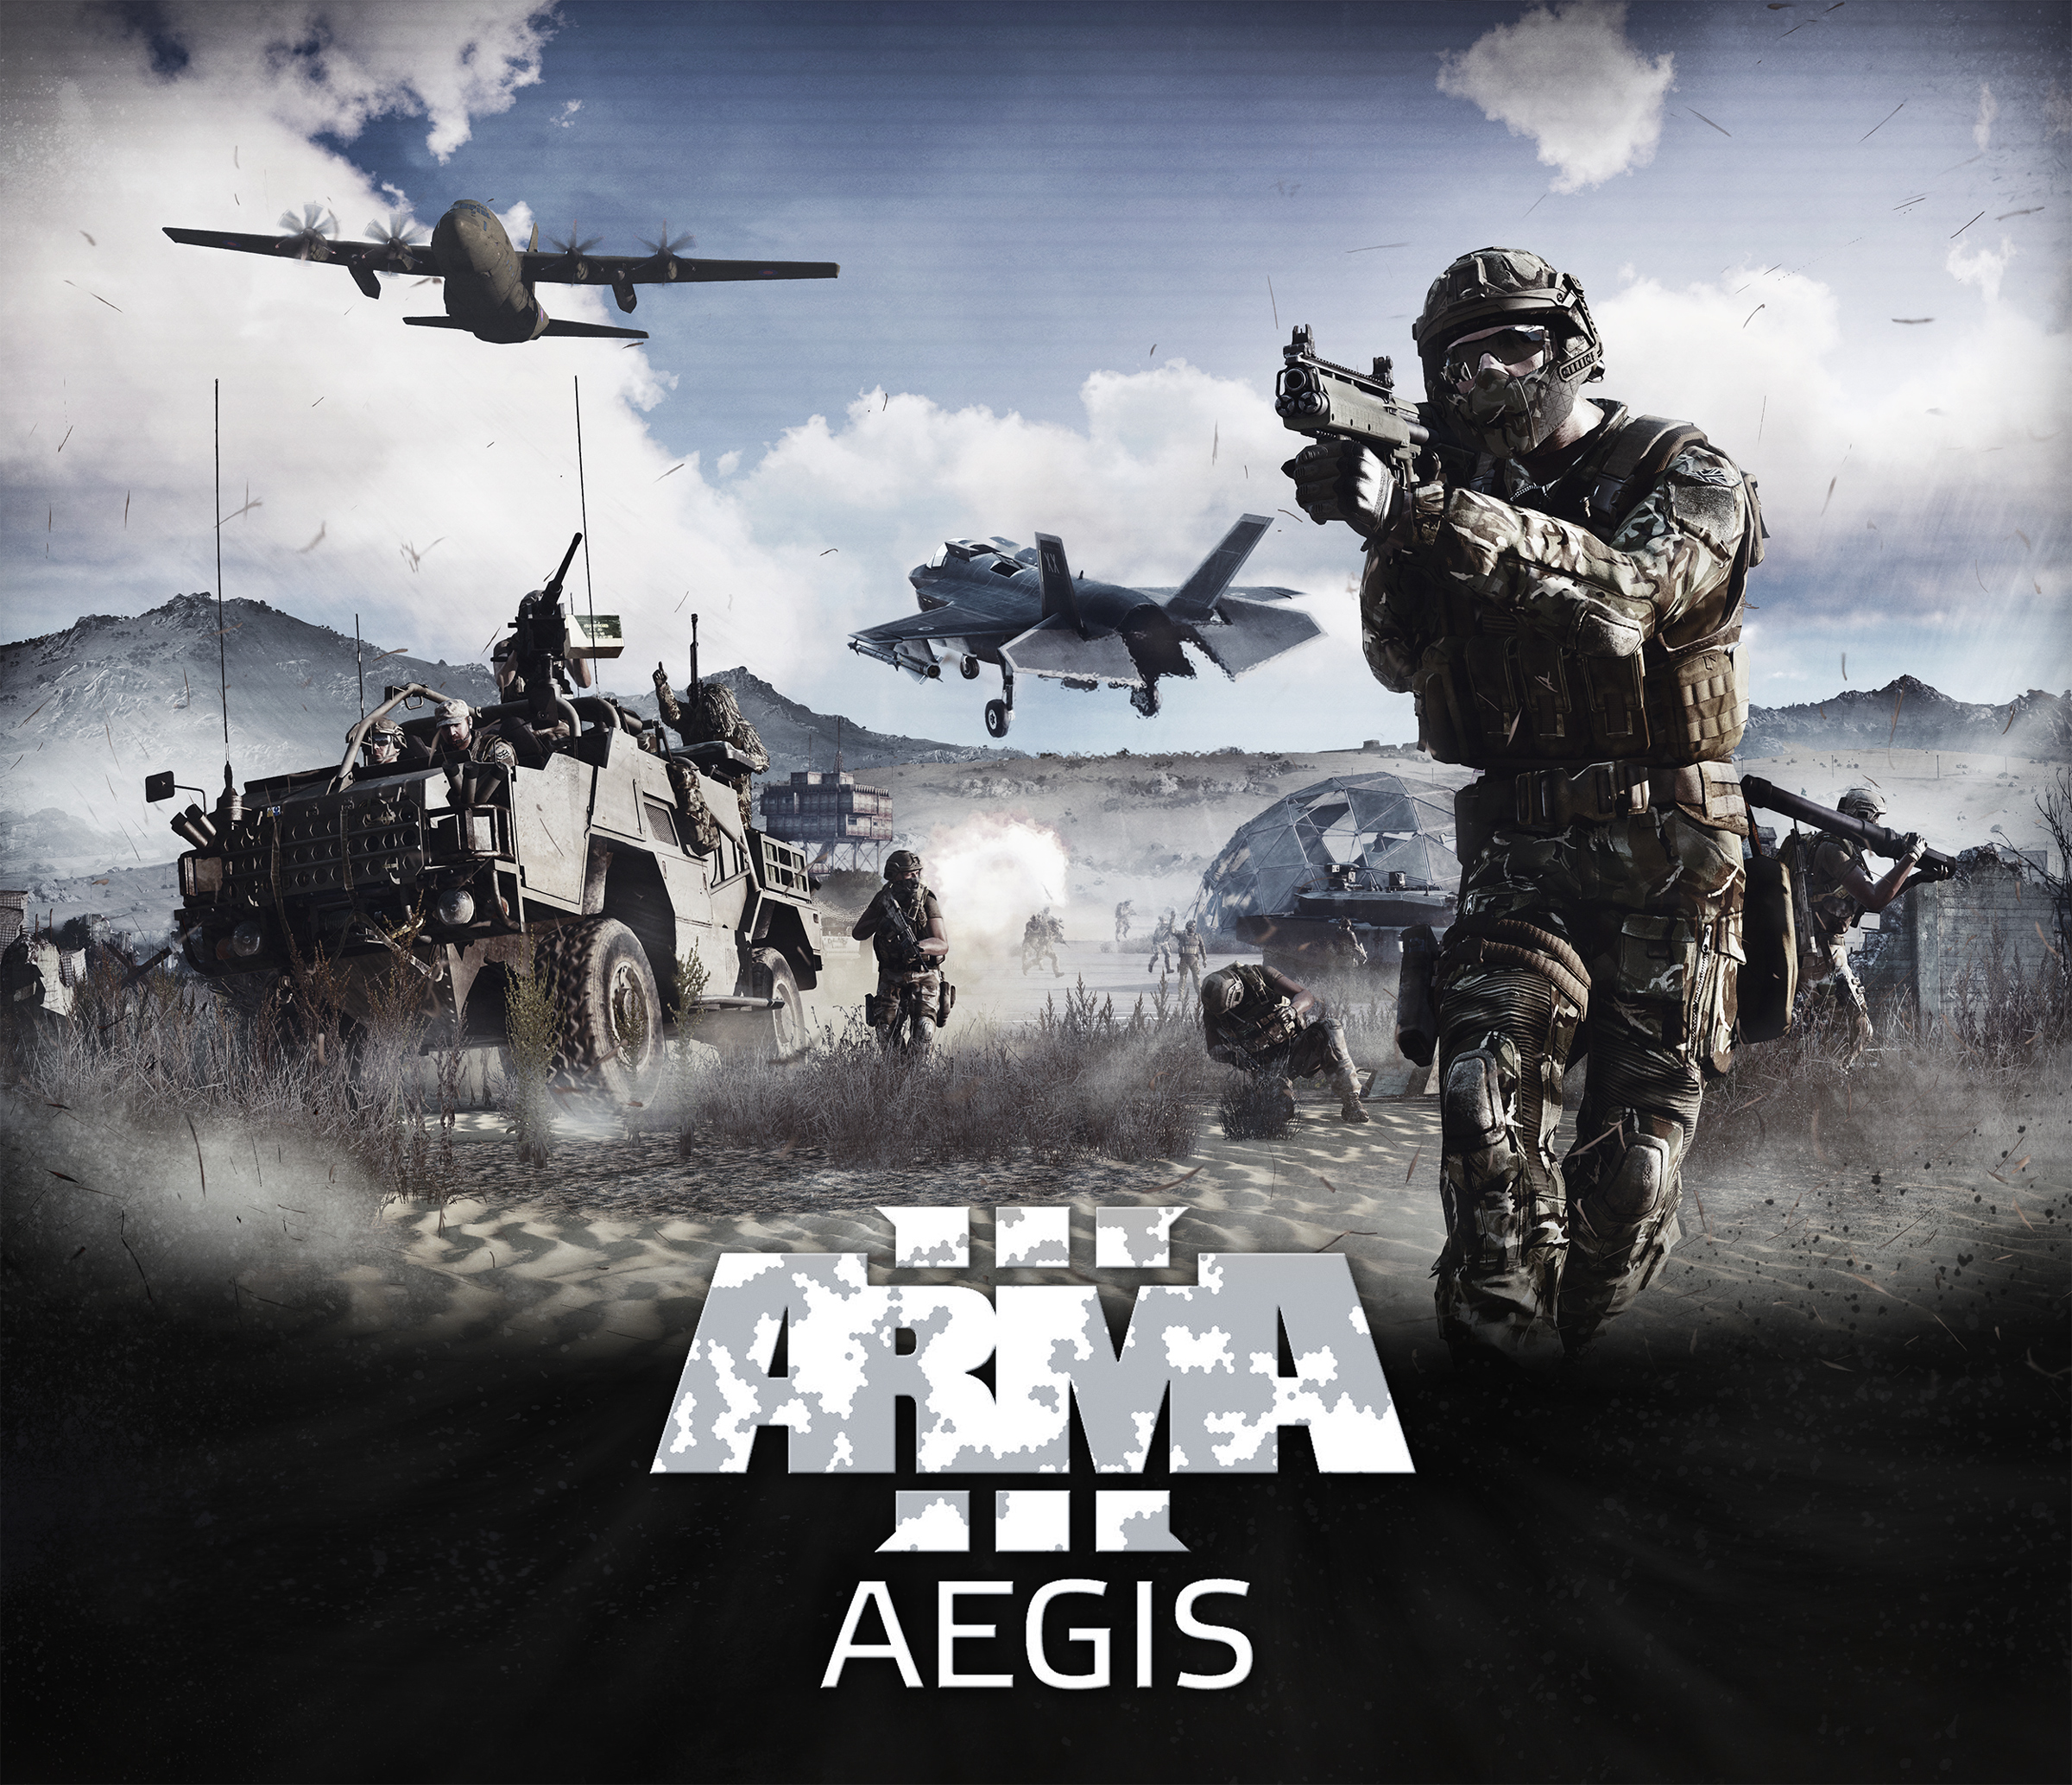 Aegis-poster.jpg